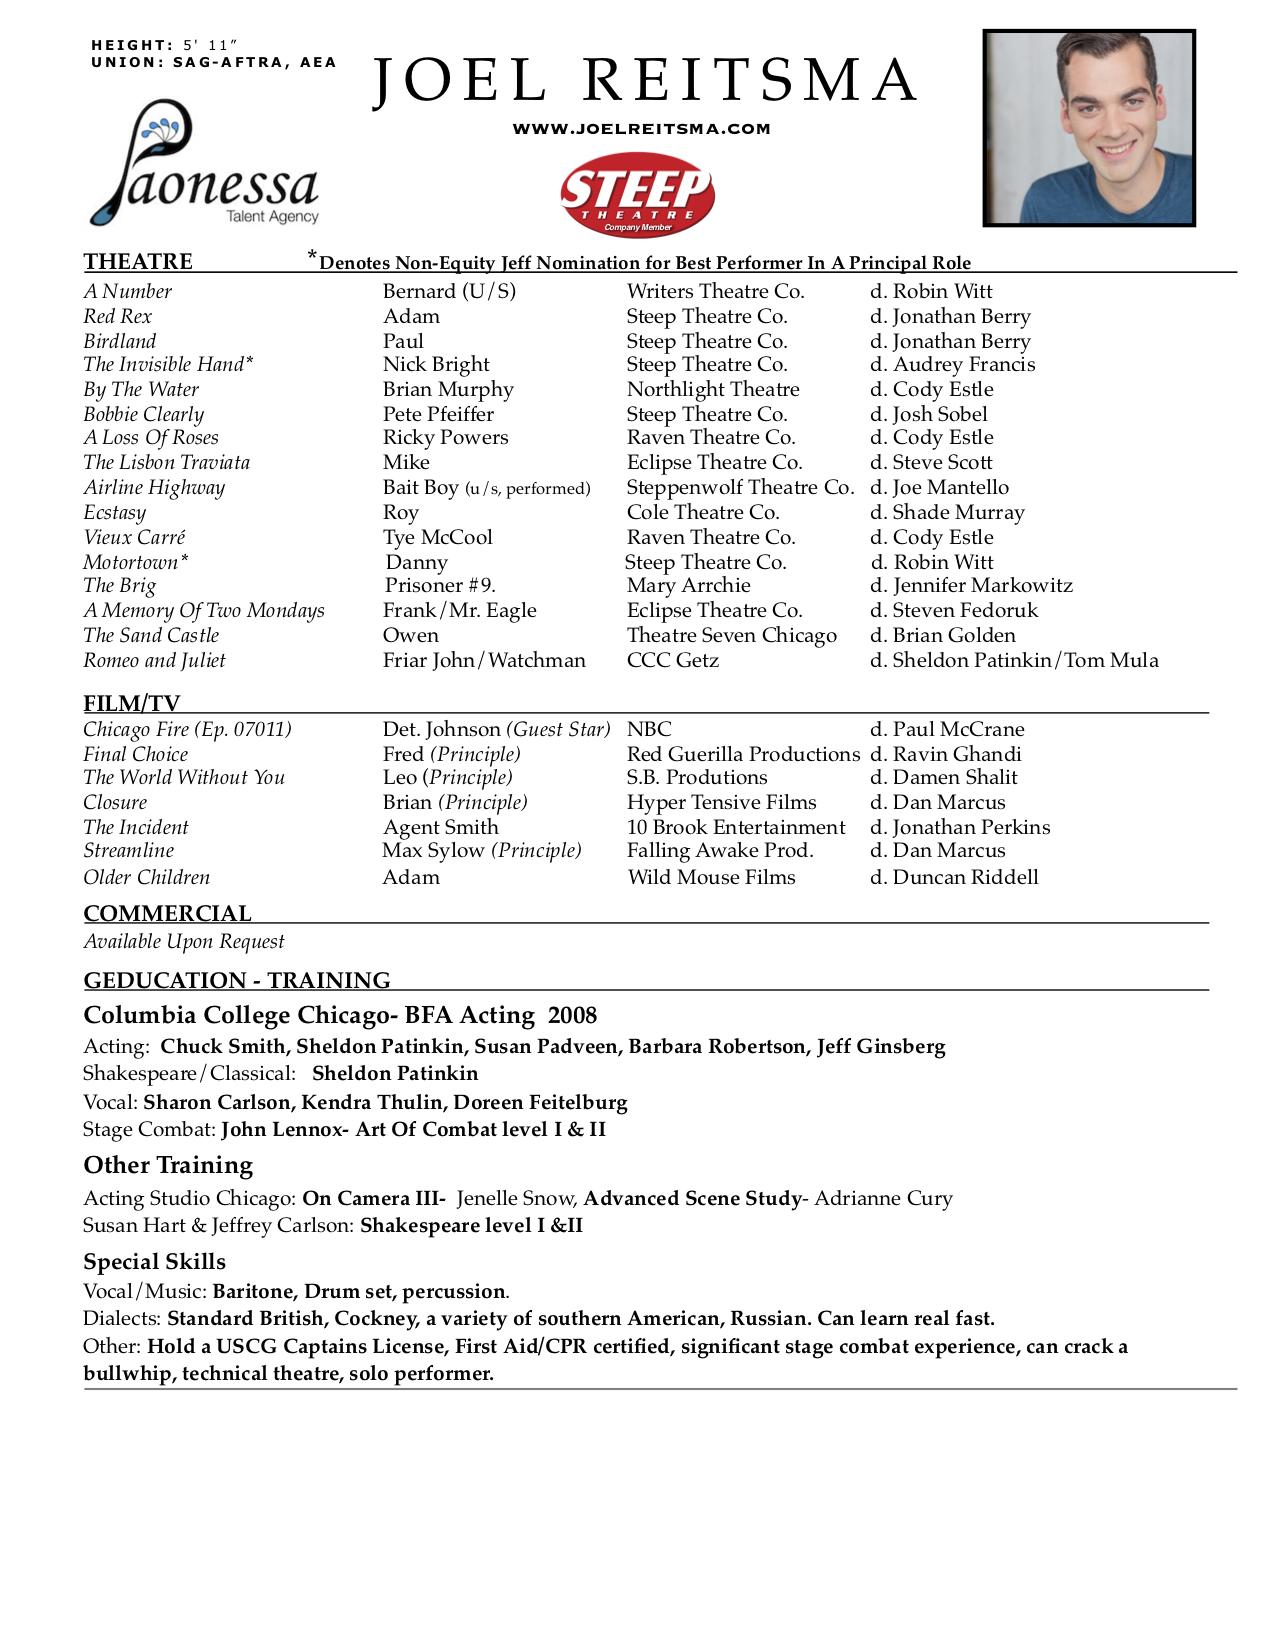 Joel Reitsma Theater Resume updt 3:17:19.jpg